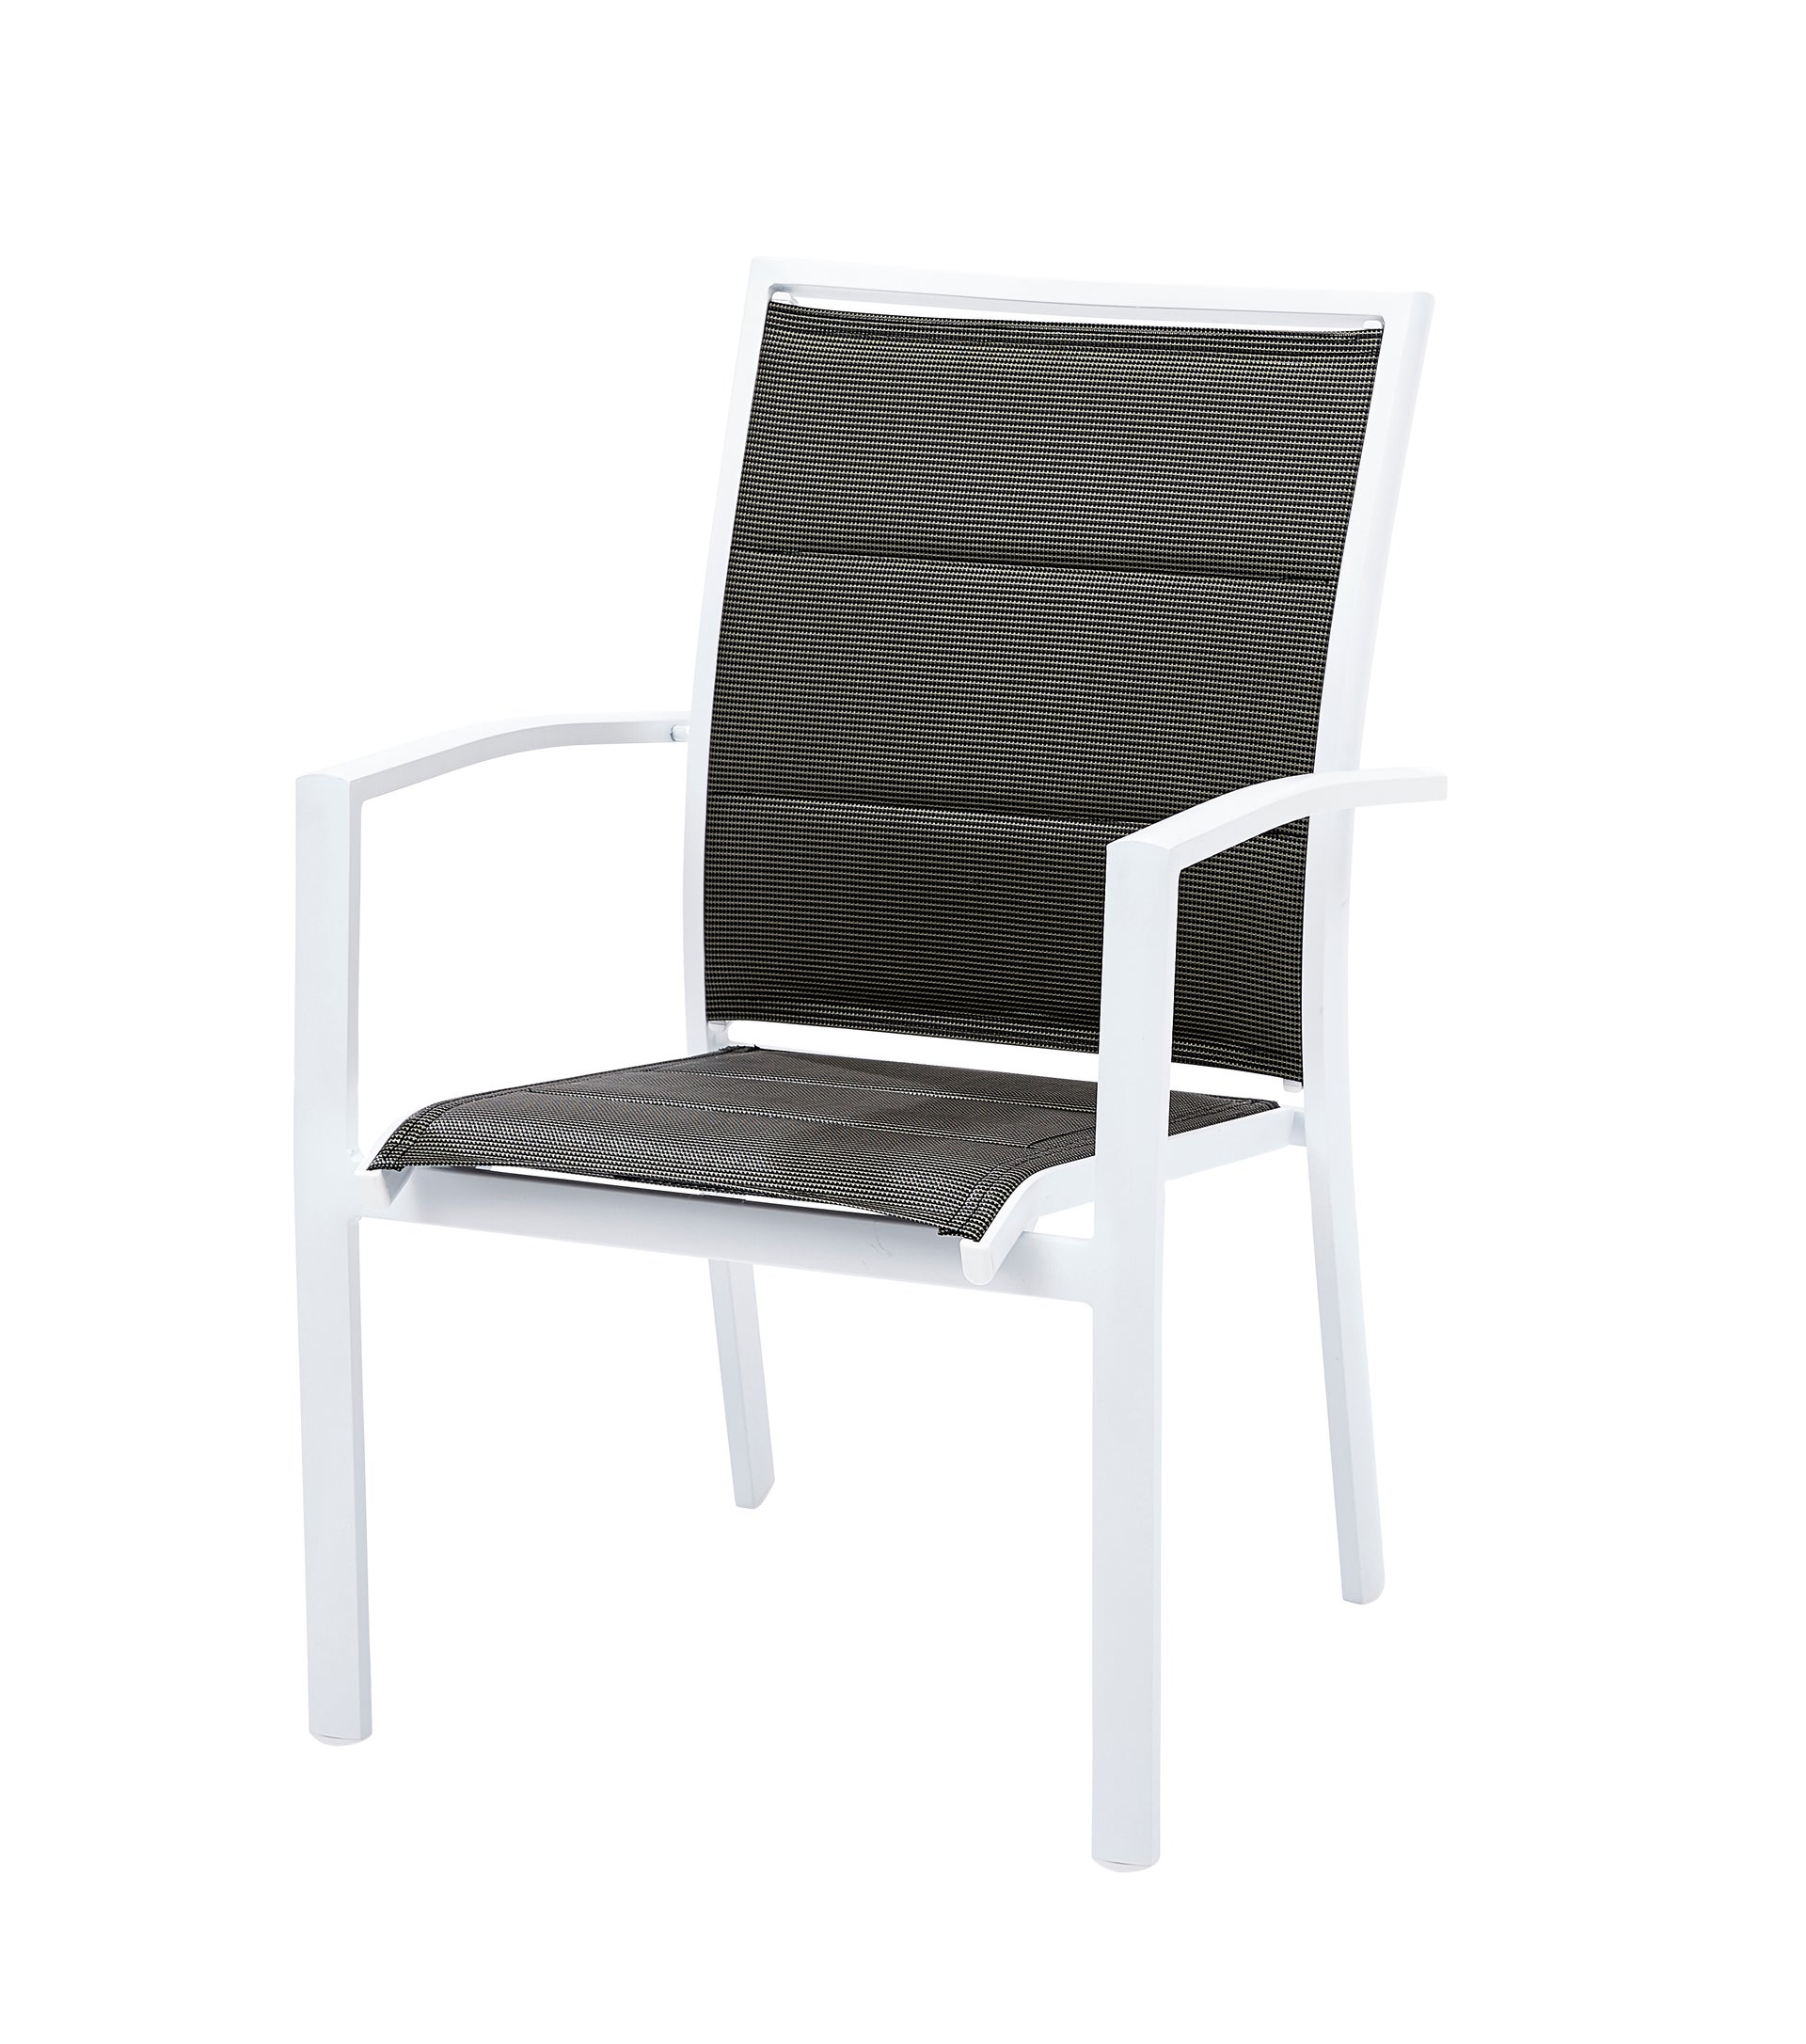 Salon de jardin Wilsa modulo t4/8 aluminium blanc, 4 personnes